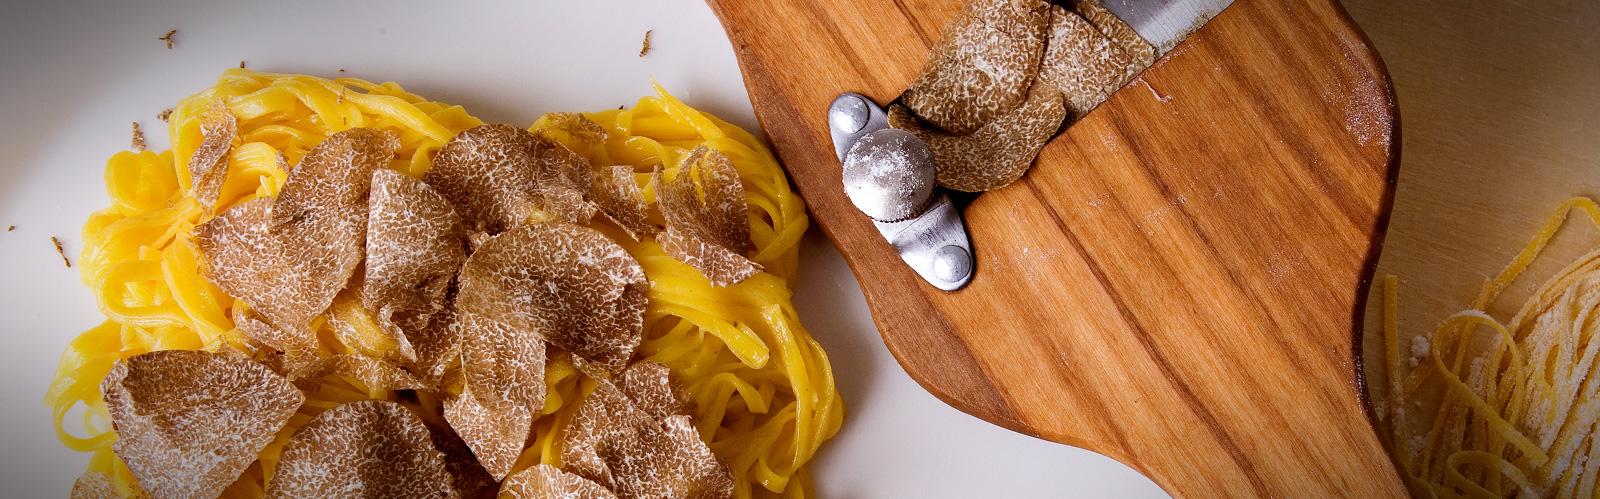 Tartufi Nacci; Il sapore di Toscana